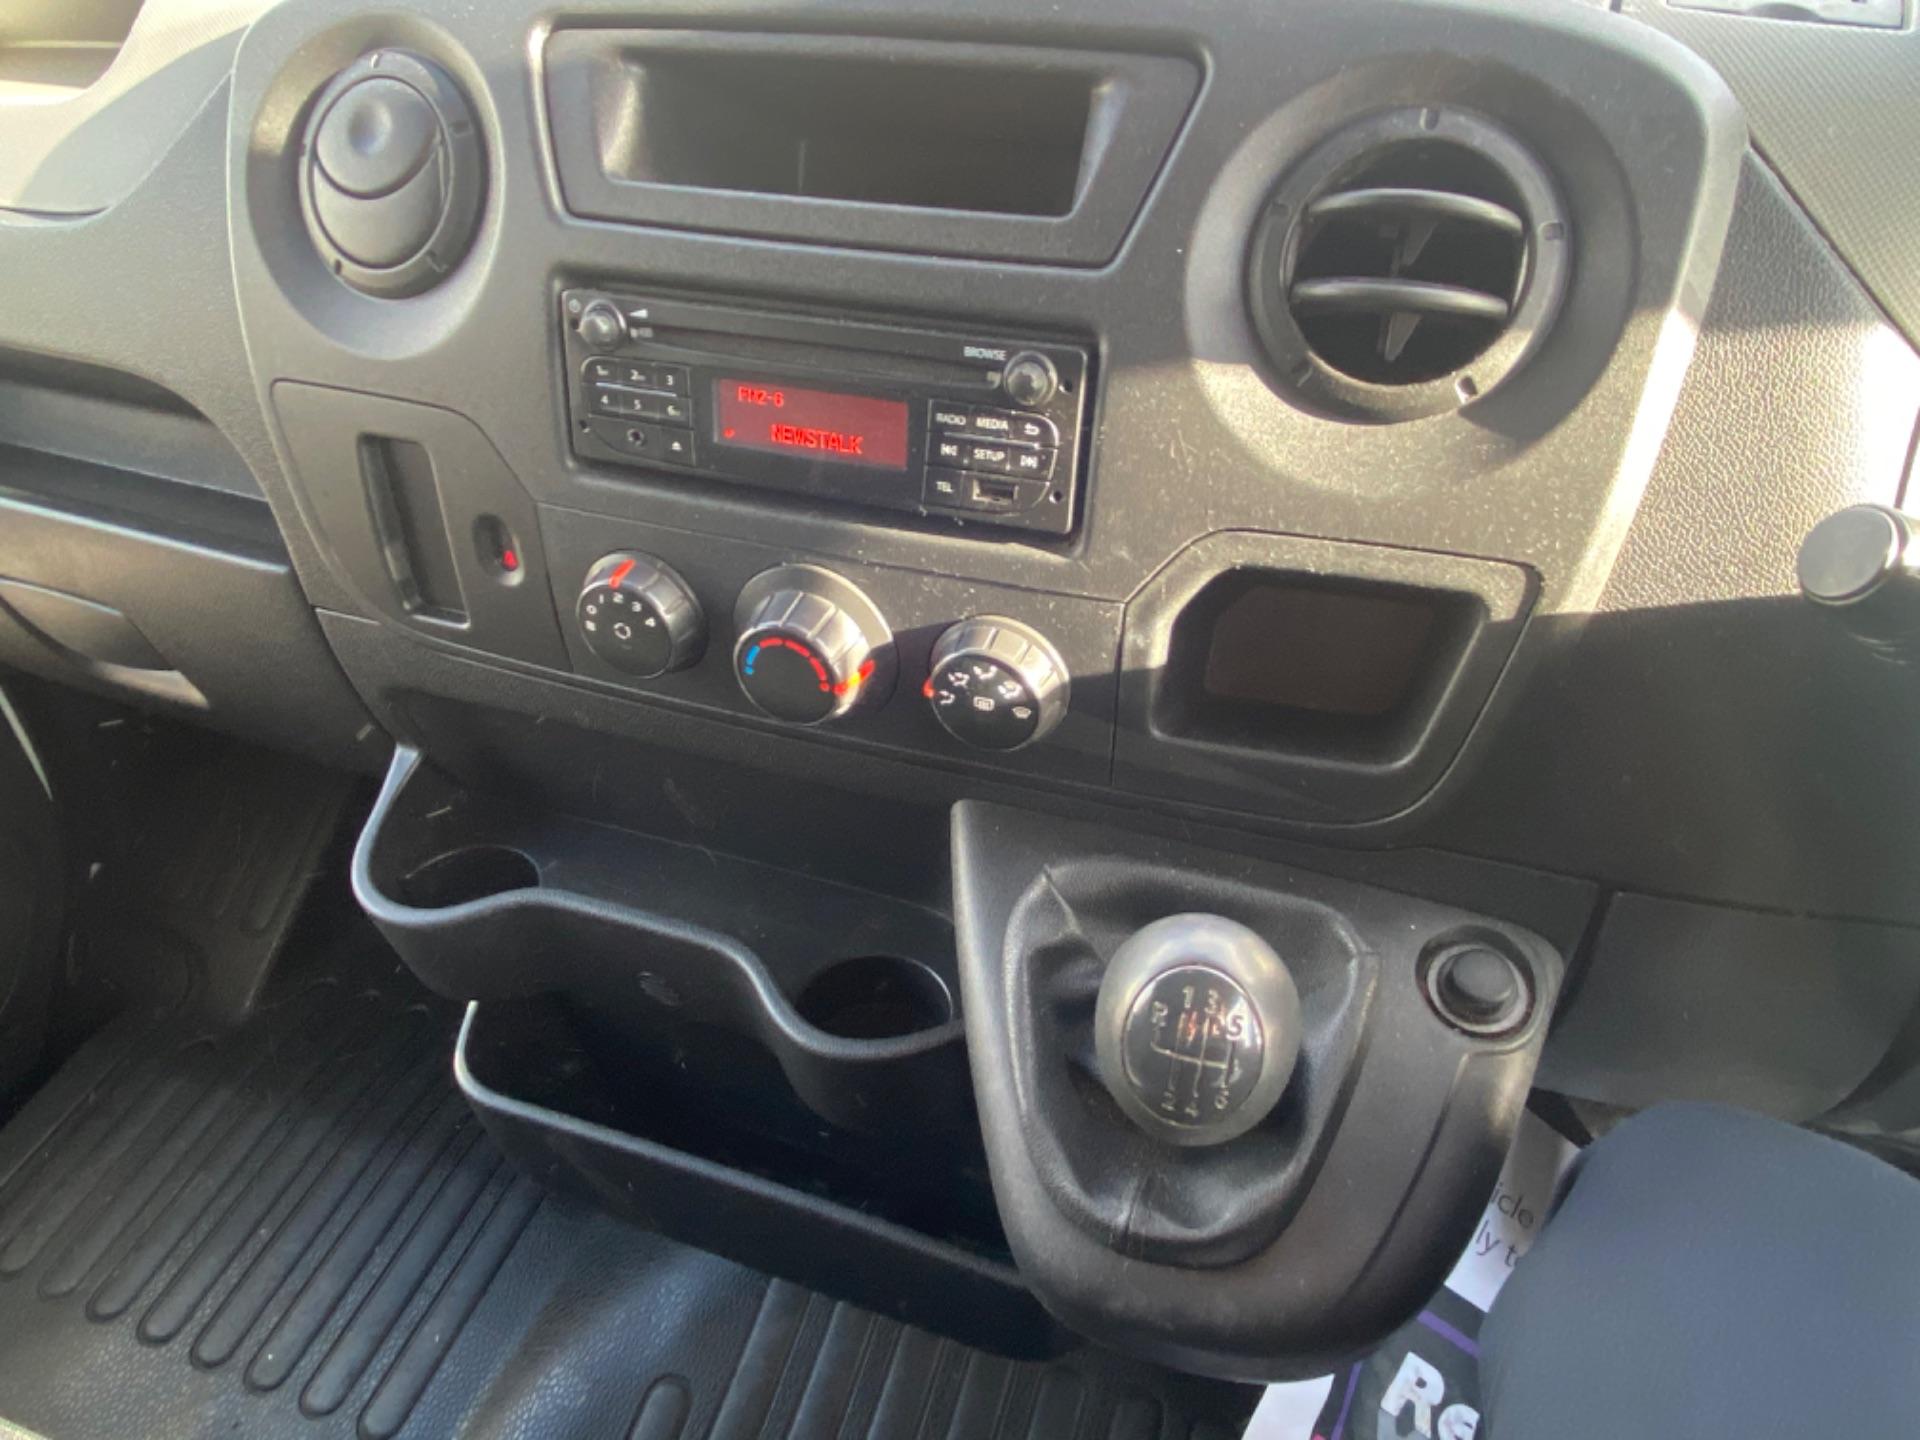 2017 Renault Master FWD LM35 DCI 125 Business 3DR (171D17814) Image 12